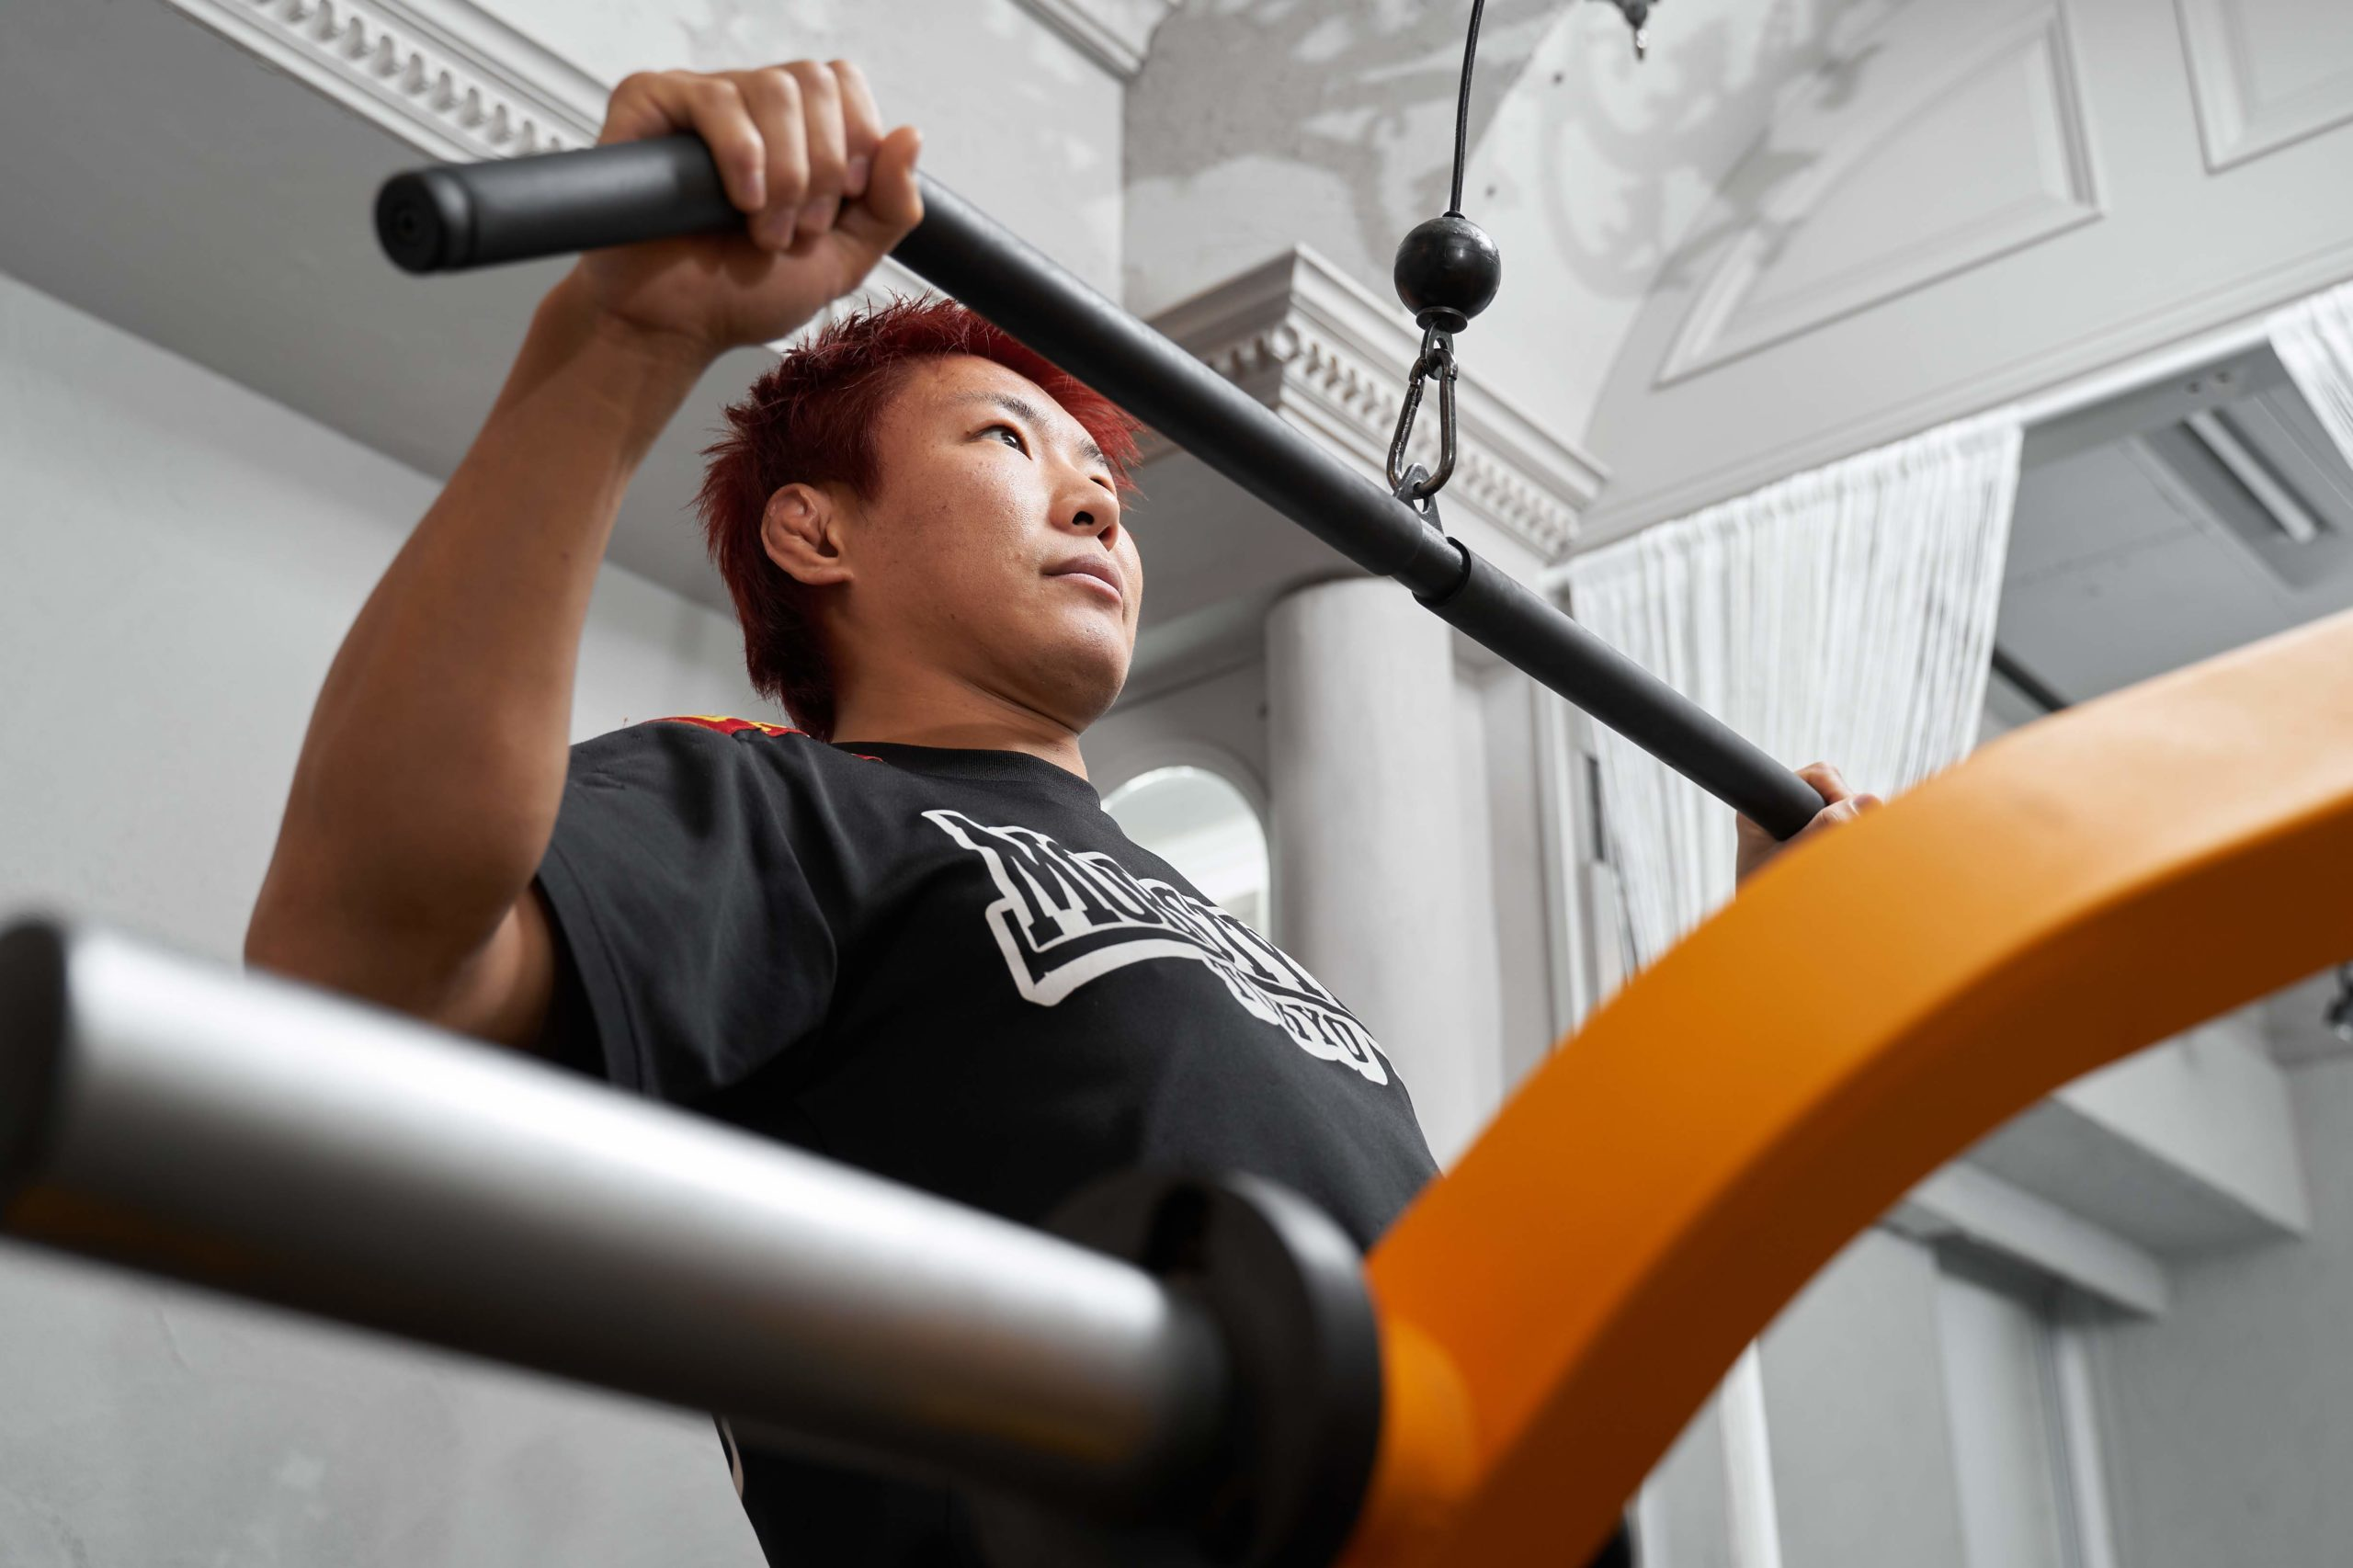 platが推す「朝のトレーニング」が「痩せる」理由!